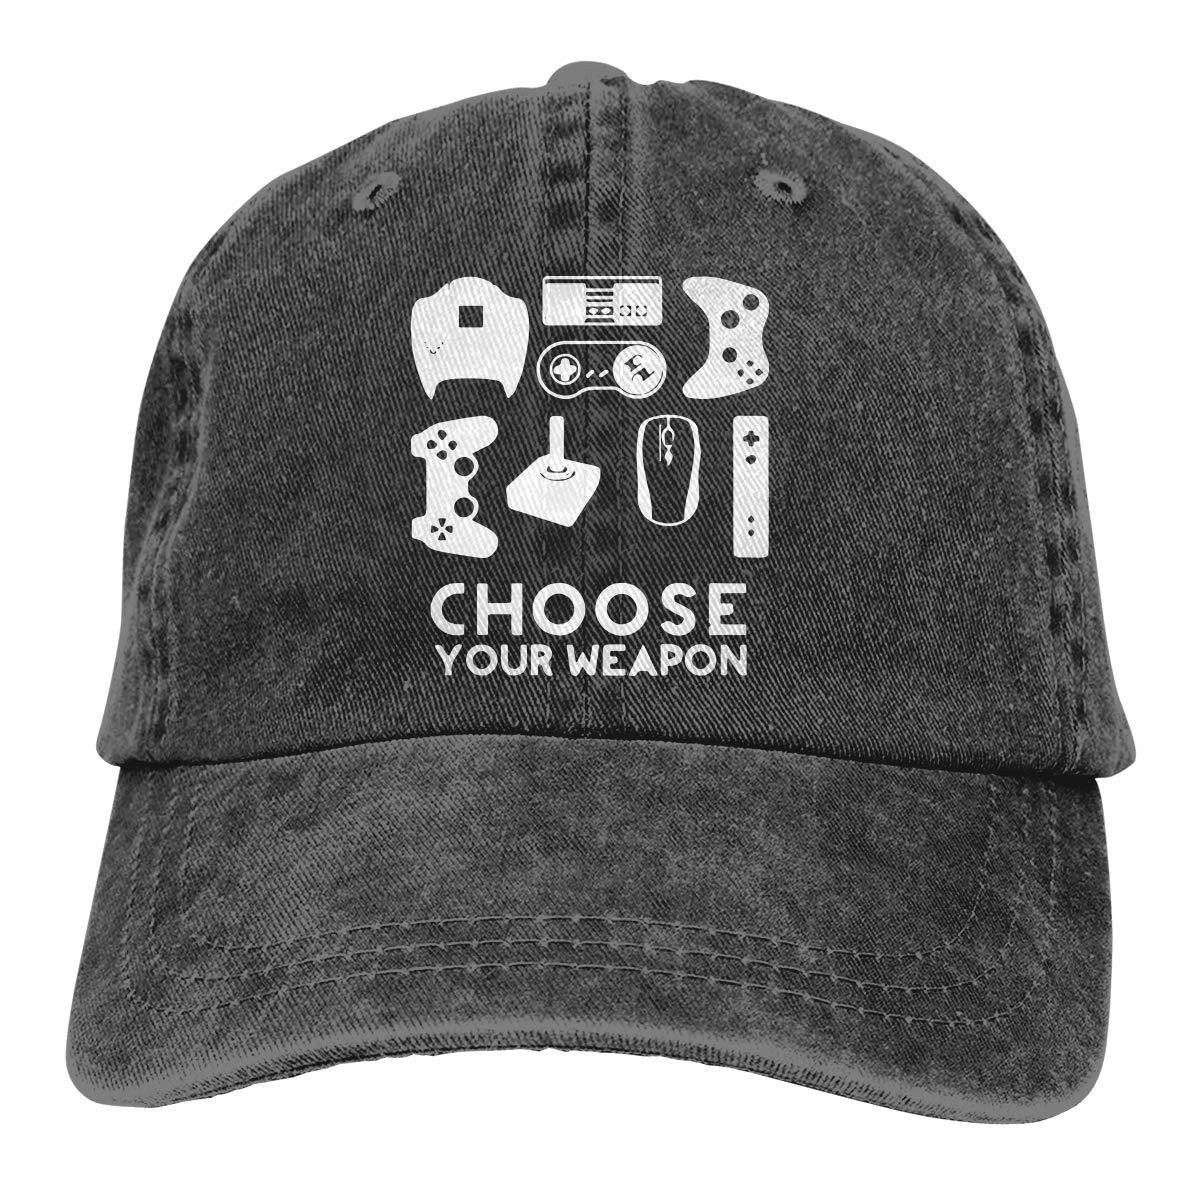 PMGM-C Choose Your Weapon Gamer Unisex Personalize Cowboy Hip Hop Cap Adjustable Baseball Cap